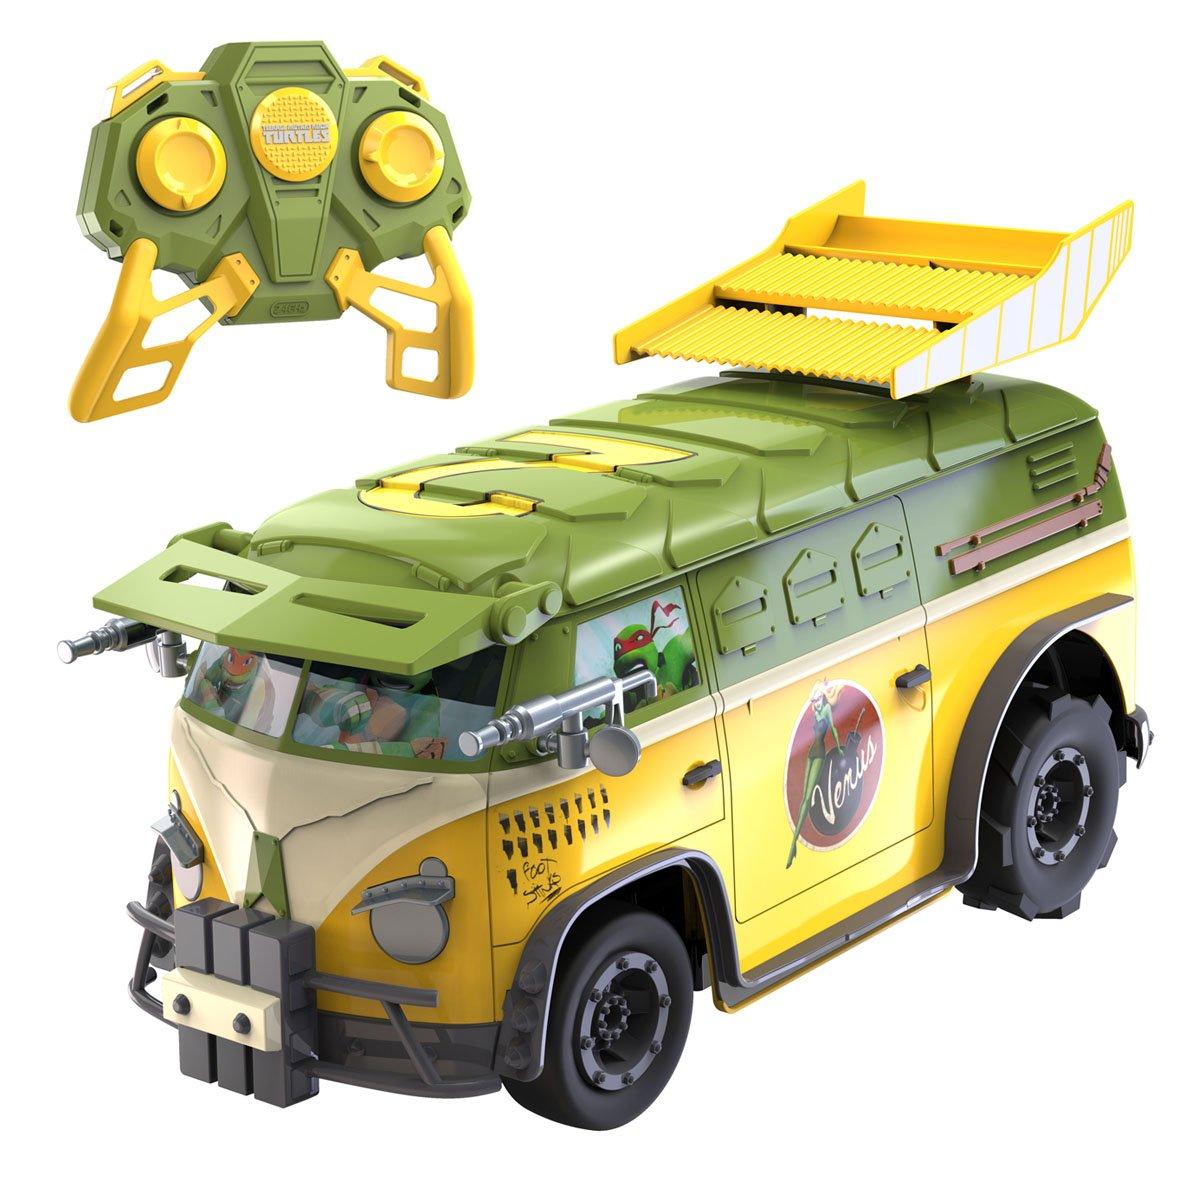 Teenage Teenage Mutant Ninja Ninja Turtlesリモートコントロールパーティーvan 2.4 – 2.4 GHz B01K26S63E, 手作り革鞄工房 futuro:9cd61ab9 --- srv.ferraridentalclinic.com.lb